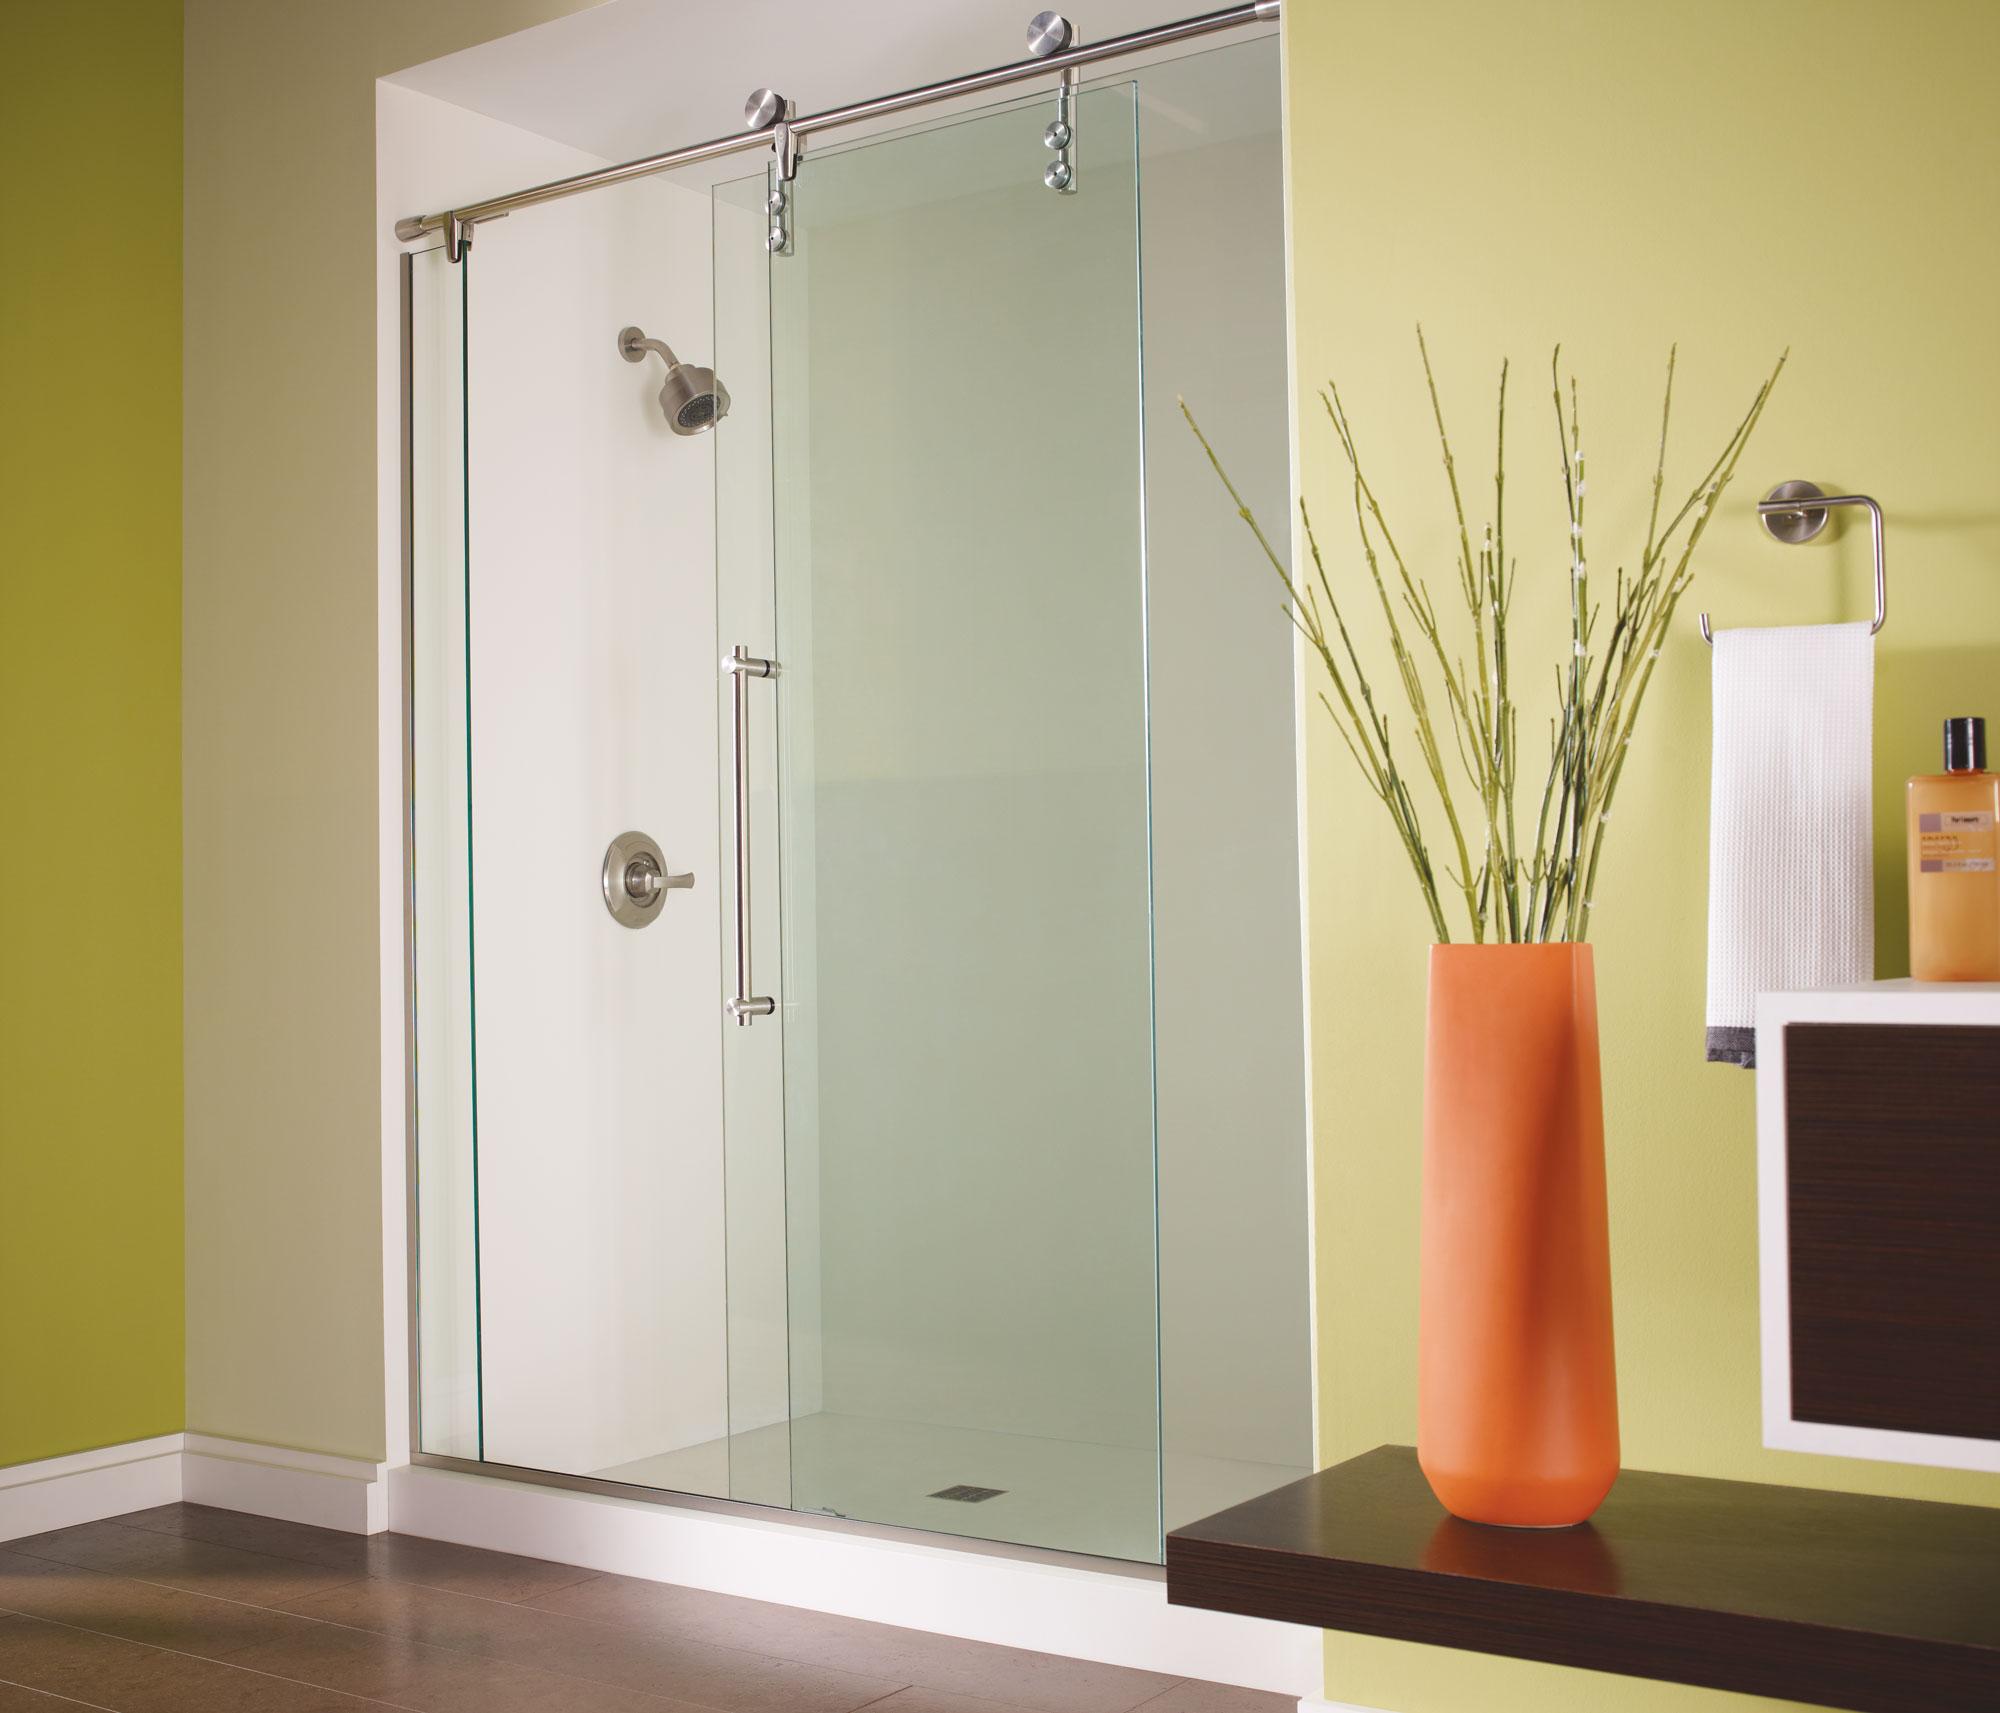 Rolaire Frameless 38 Inch Glass Panel Rolling Basco Shower Doors